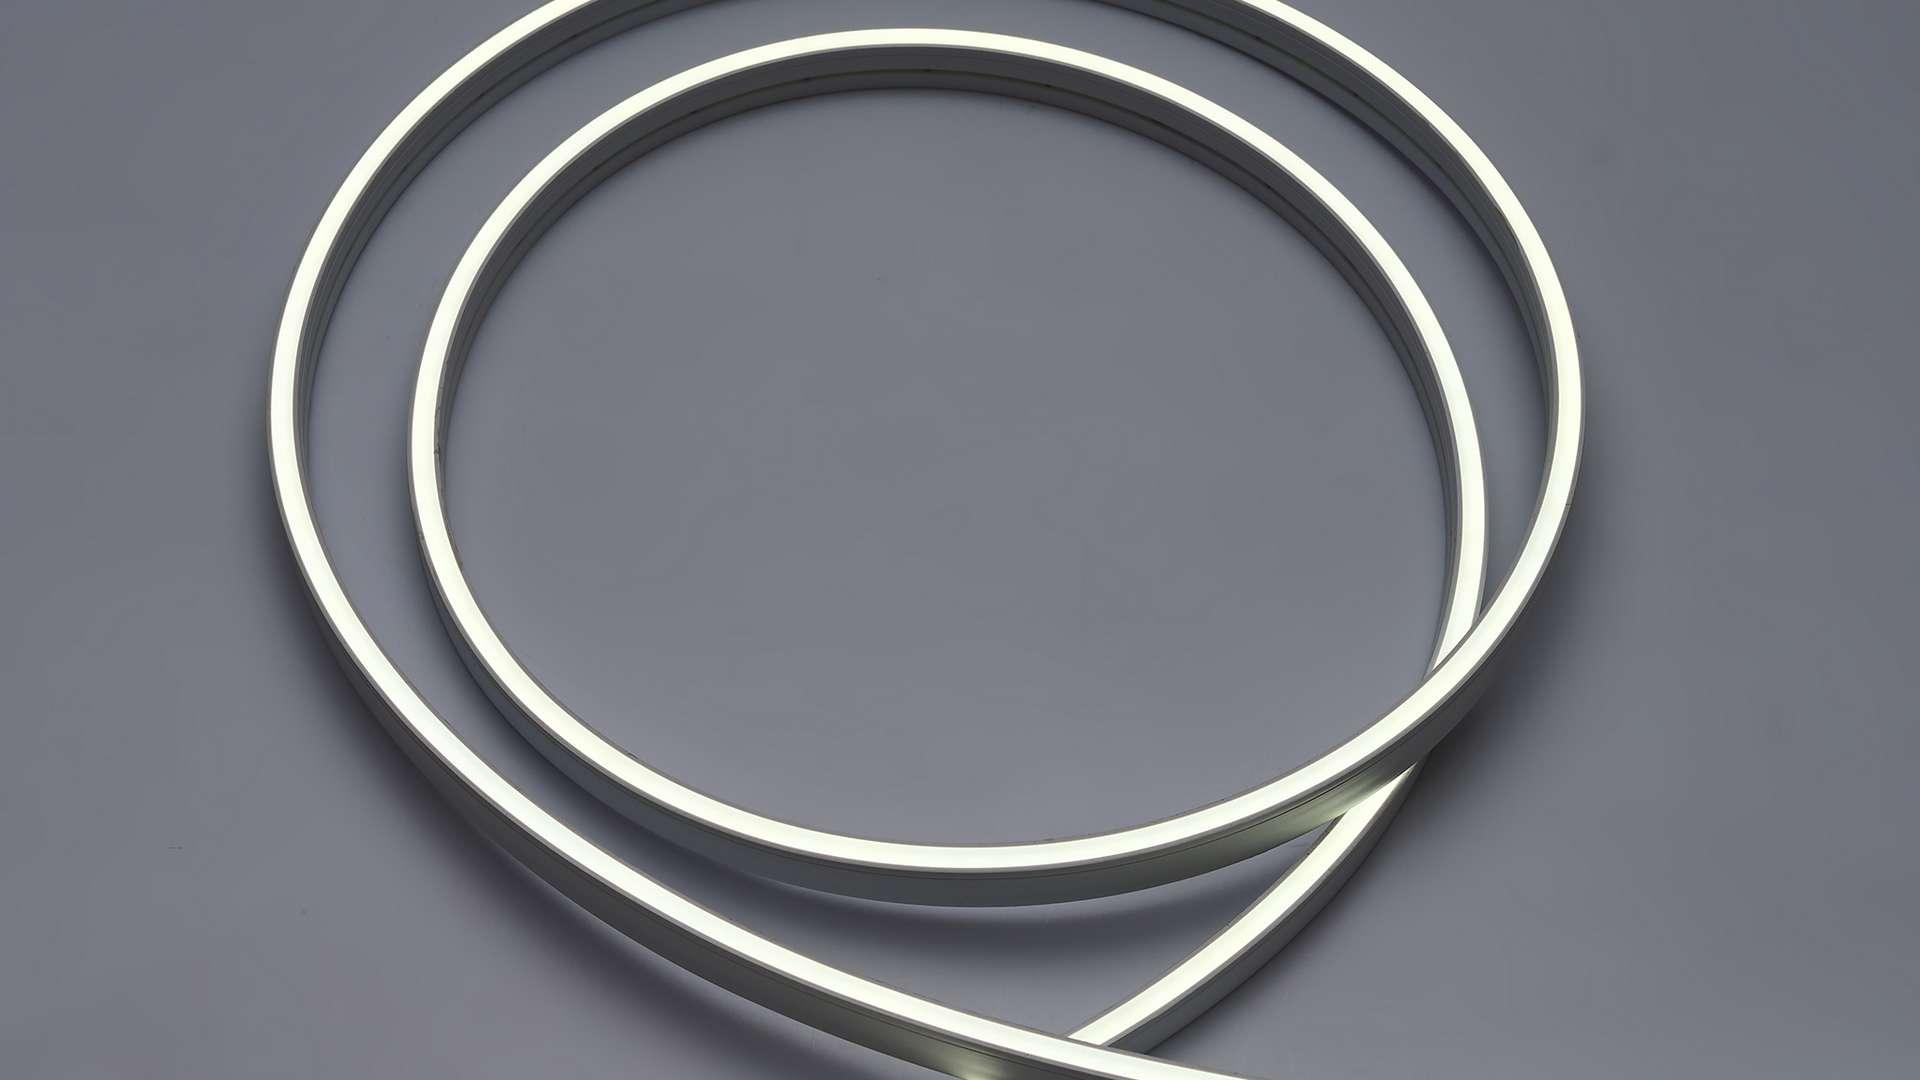 LED Neon Flex 3Y 6x12 140 LED/m 10,8W/m 24V Neutral white